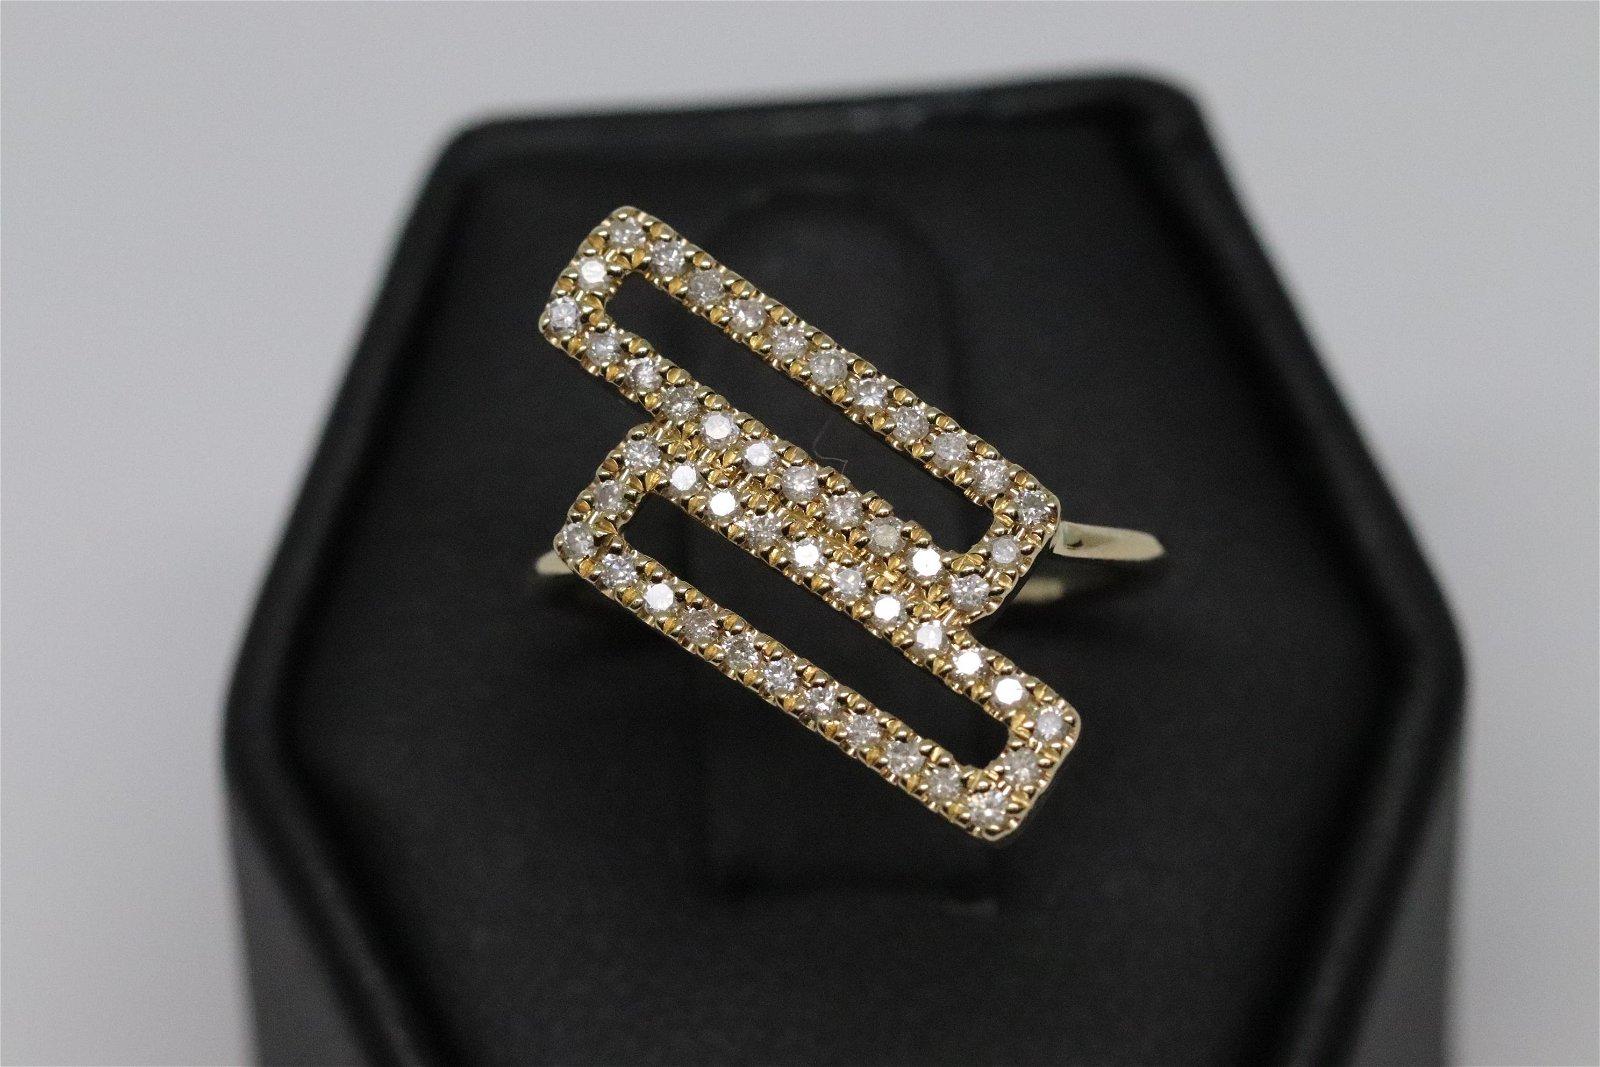 14k Modern Diamond Ring